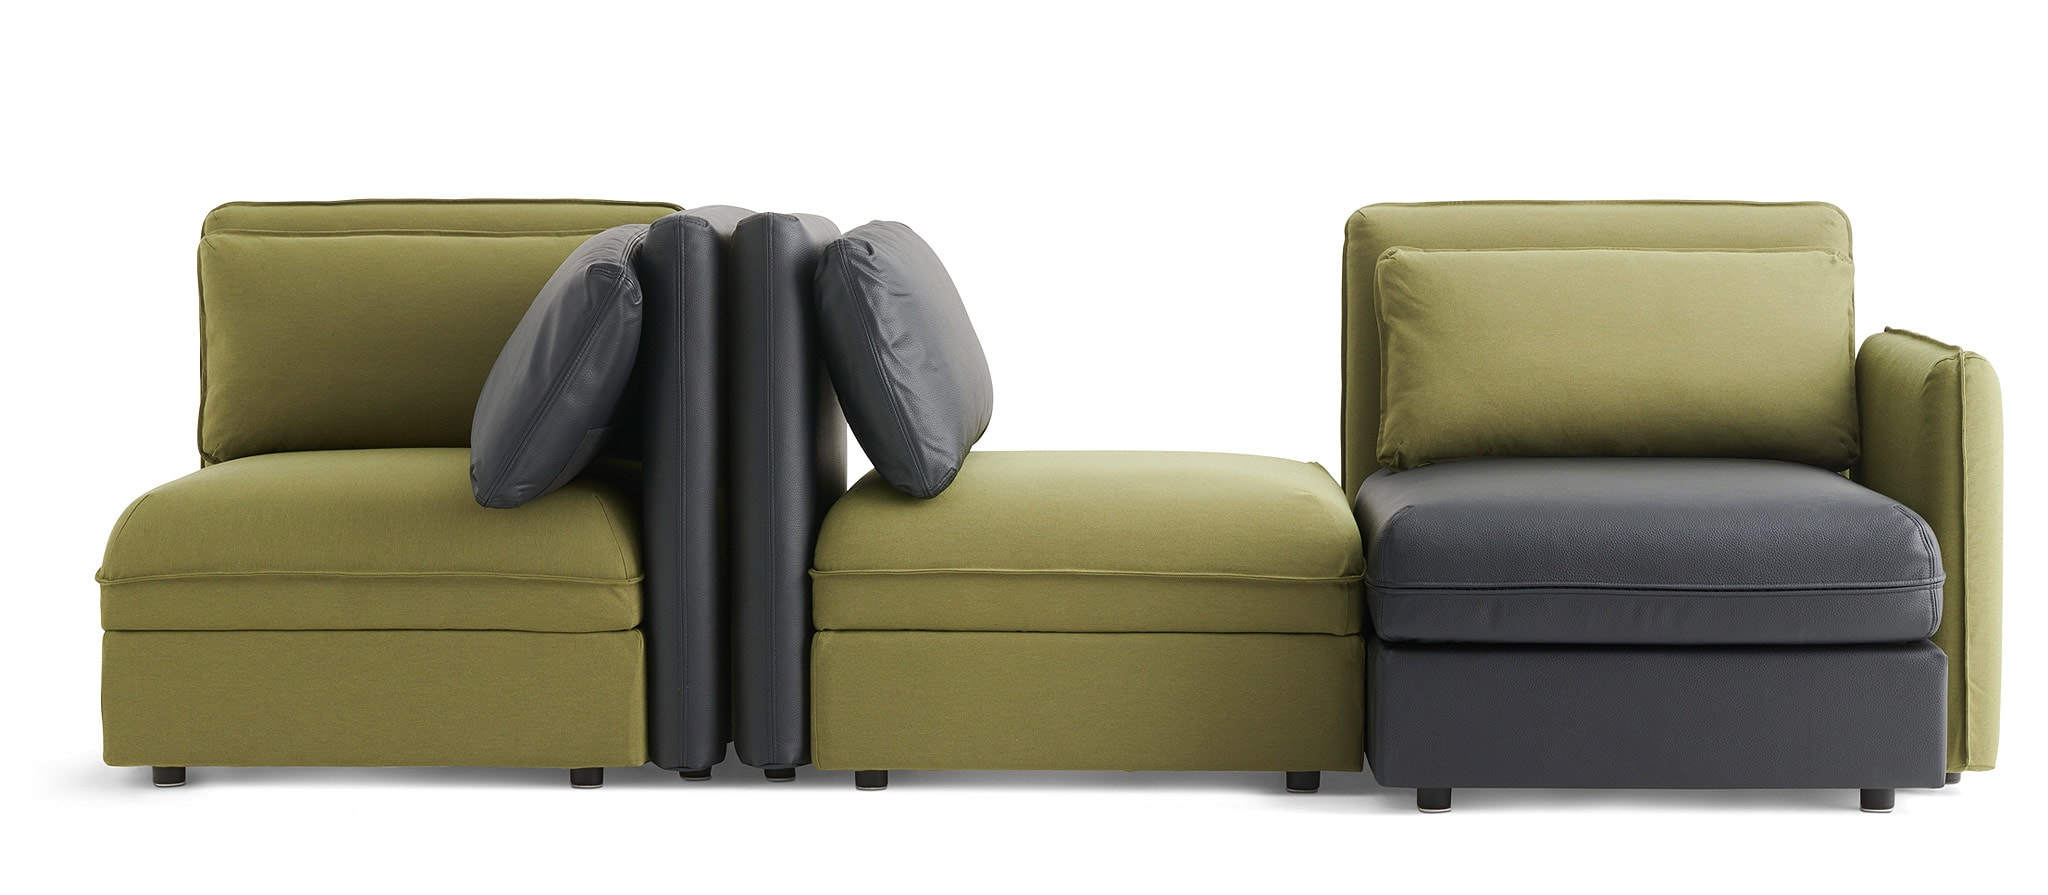 Sofa Modular X8d1 Modular sofas Sectional sofas Ikea